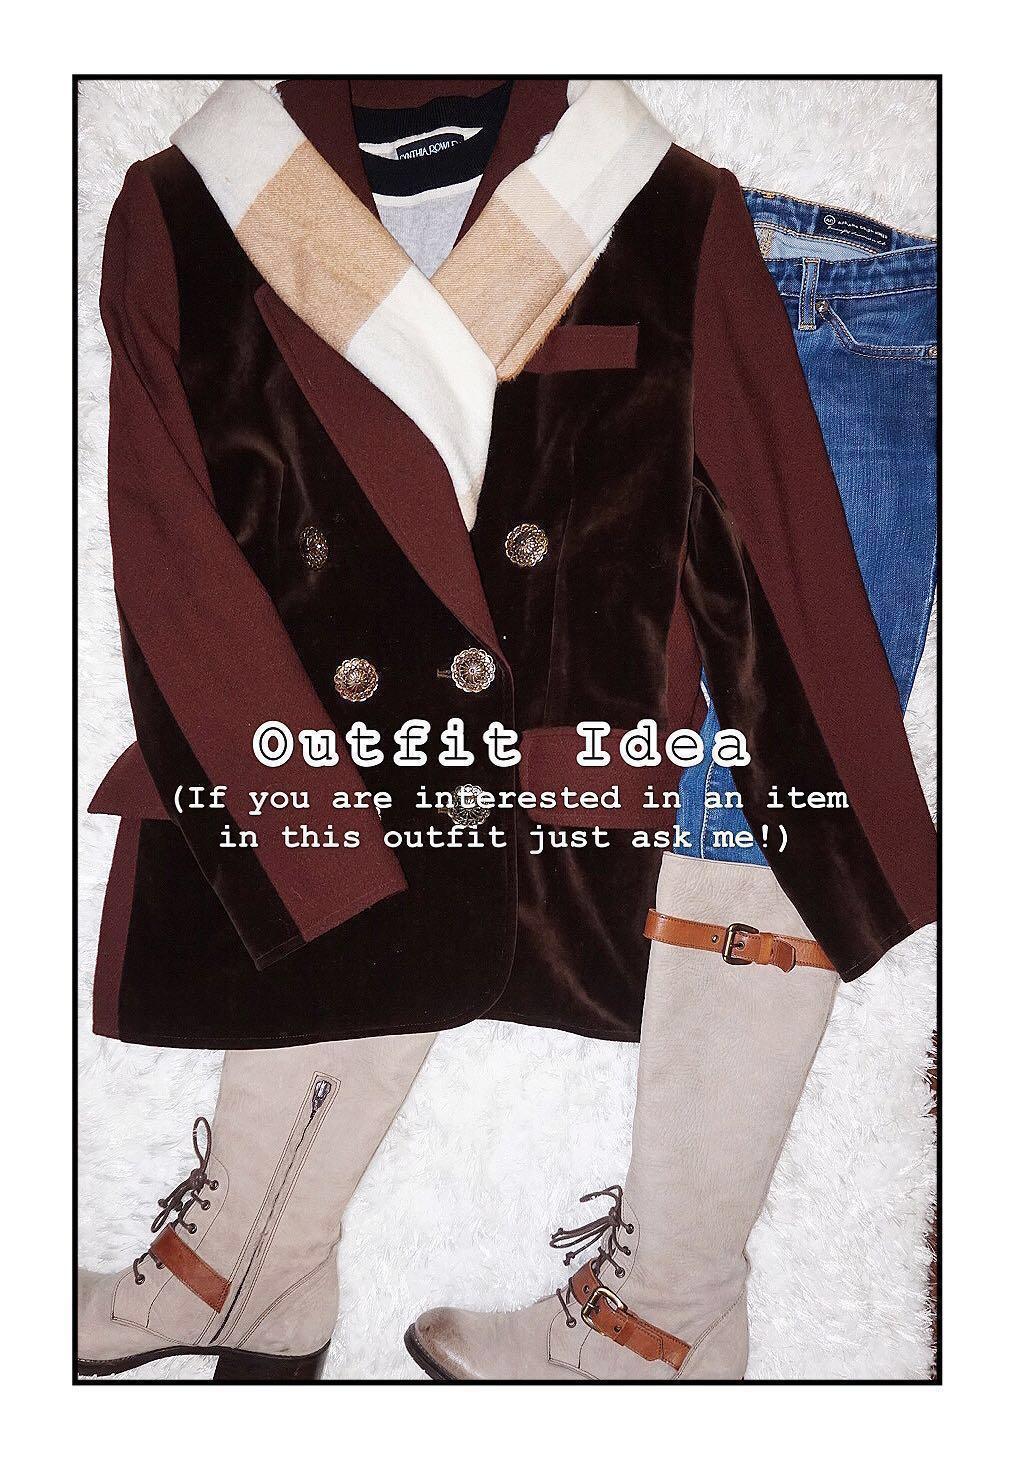 *Great Condition Designer Brand* Christian Lacroix Made in France  100% Wool + Velvet Double-breast Blazer Coat Women Size 42